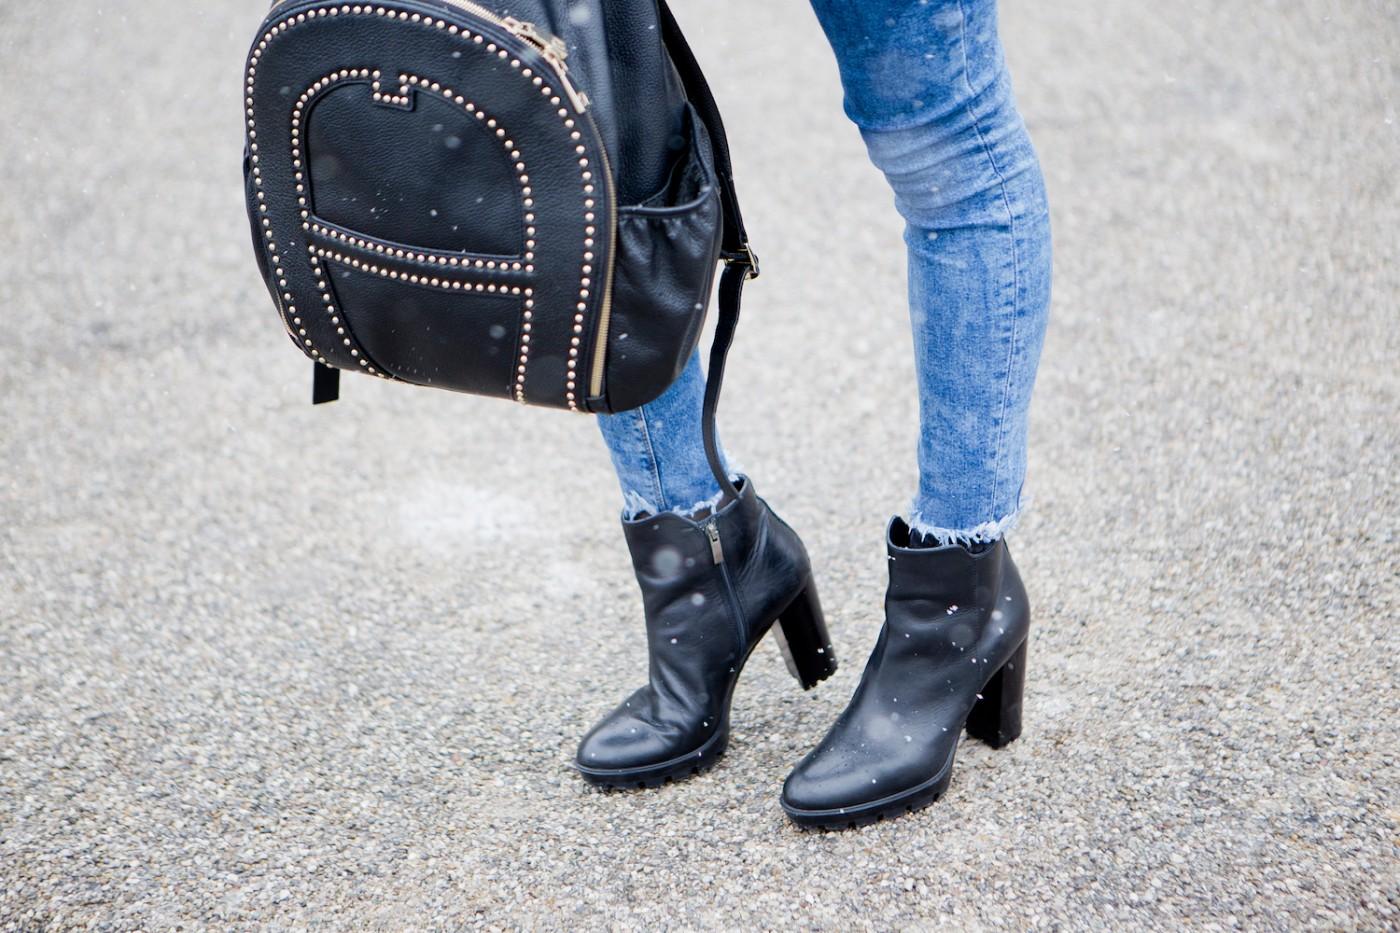 useyourand, The Golden Bun | München Modeblog, German Fashion Blog, Fashionblogger, new trends